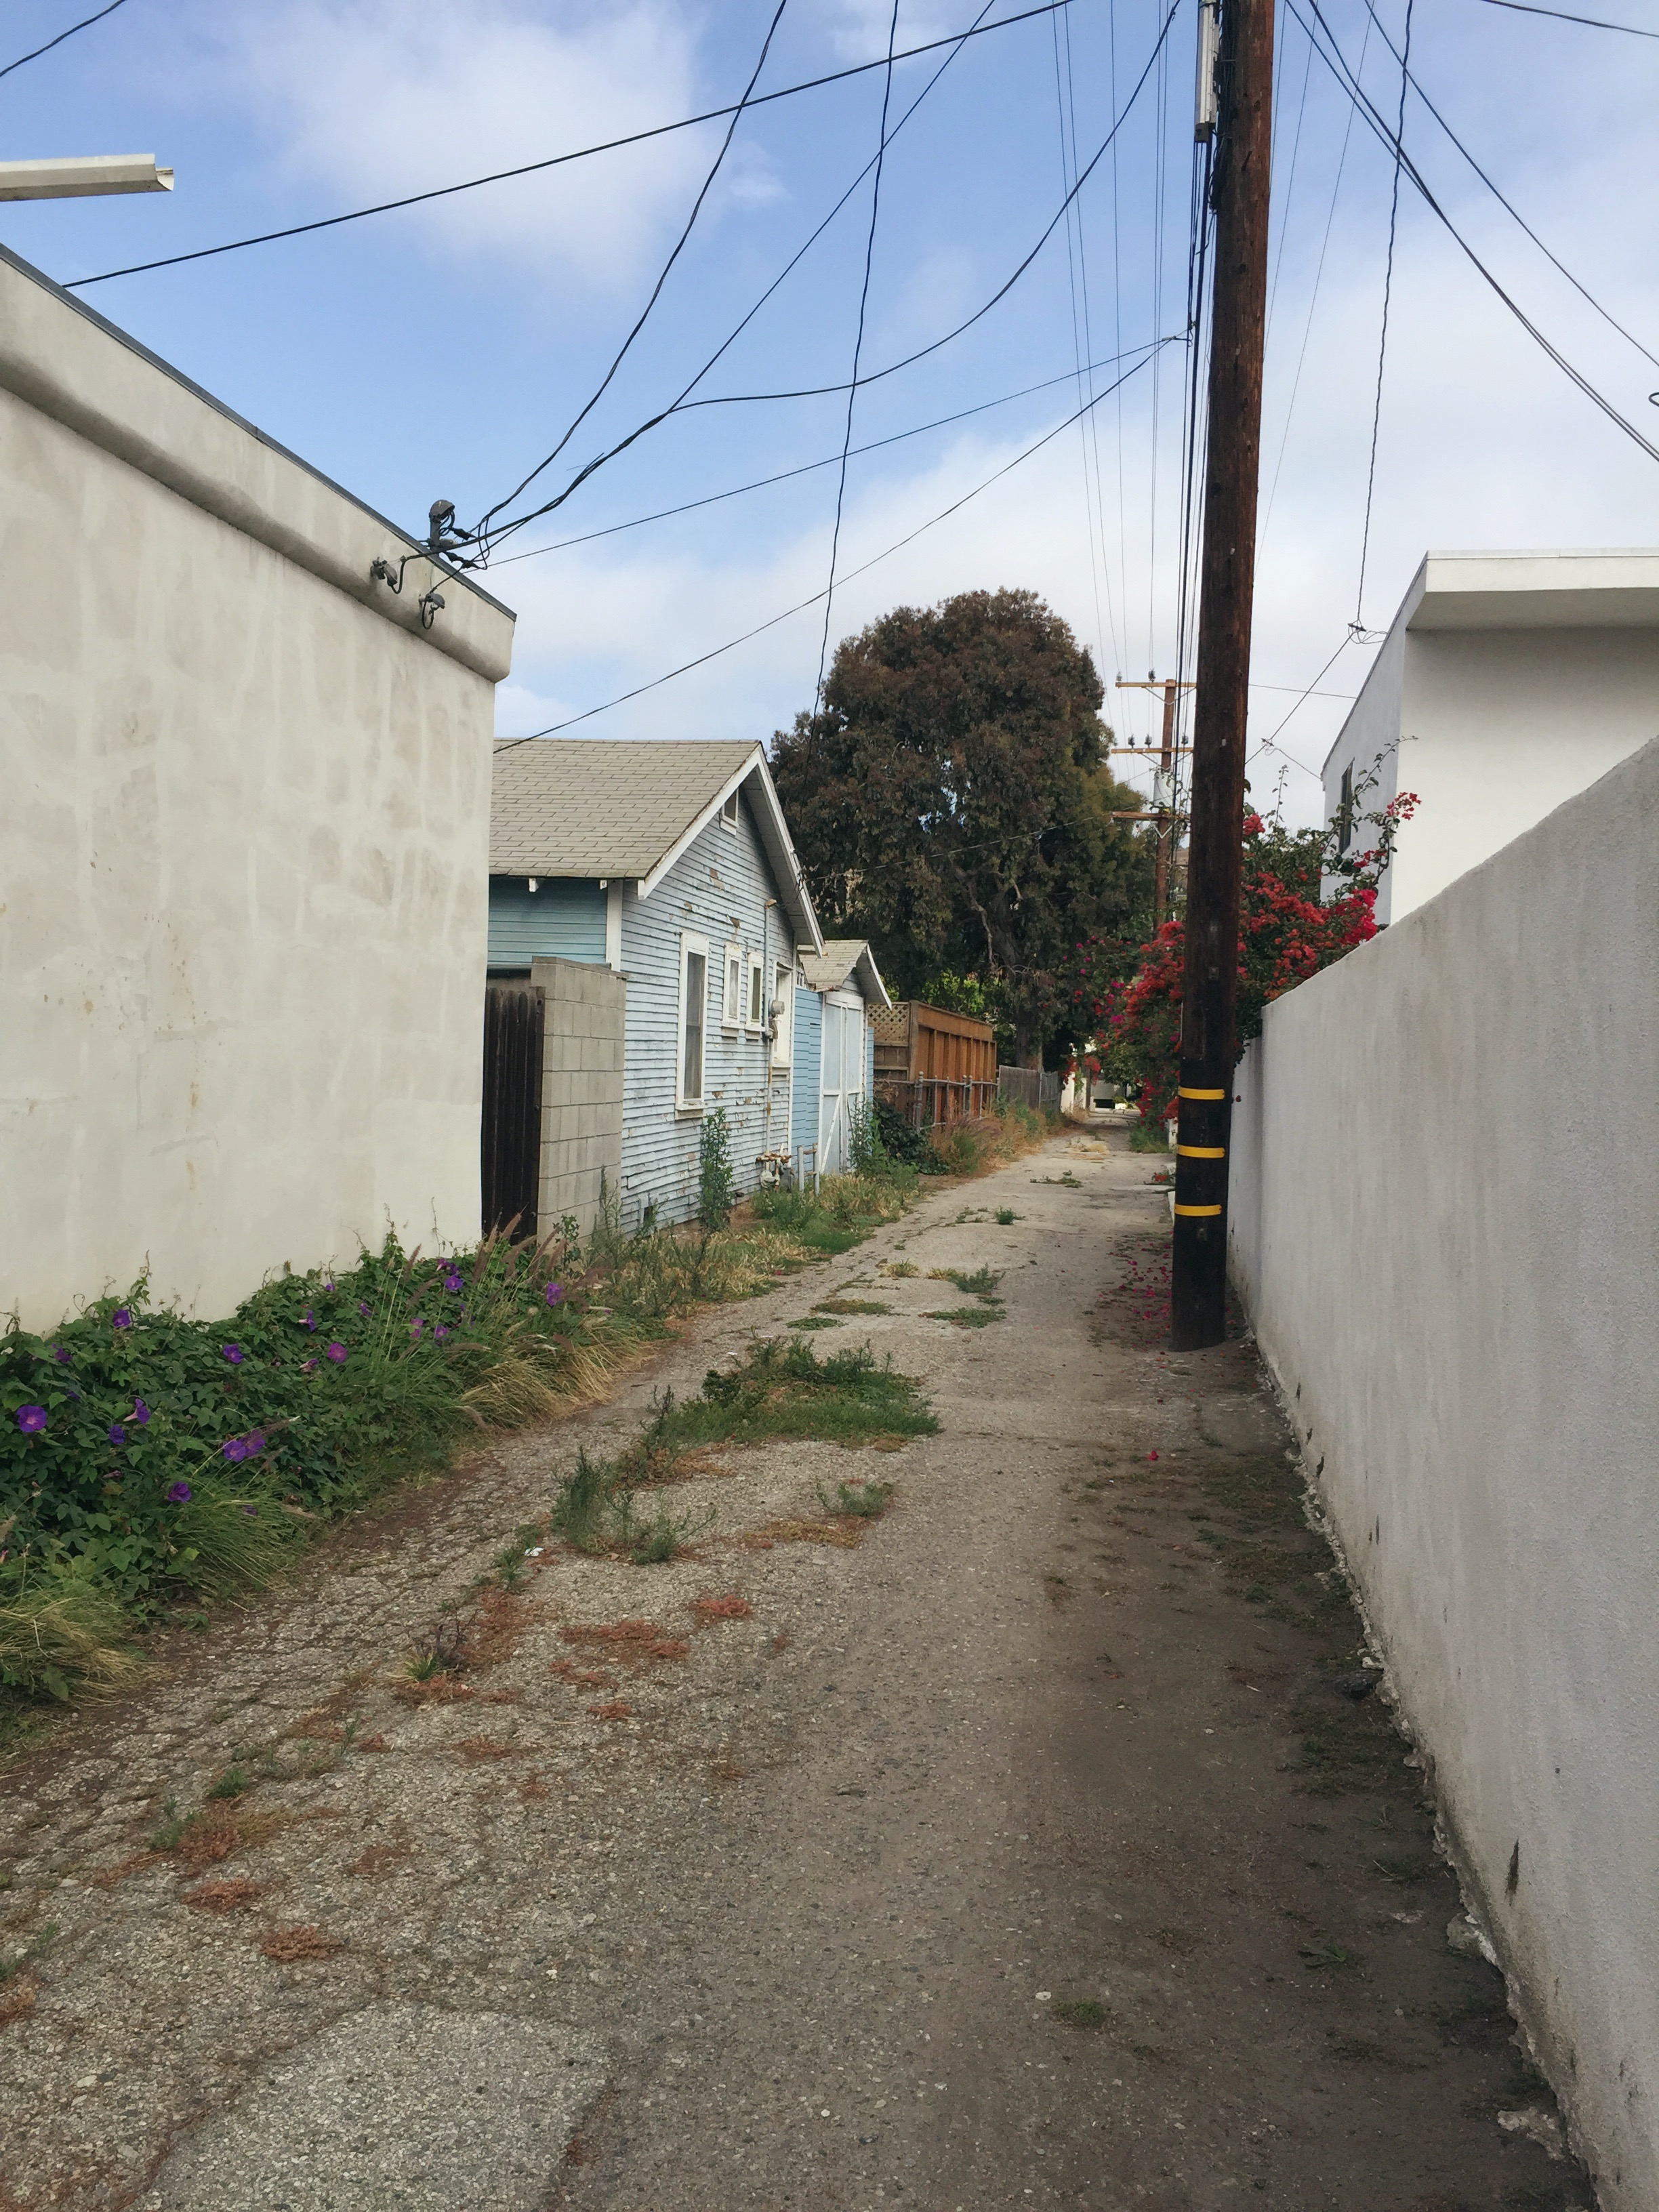 LA alley maggie whitley